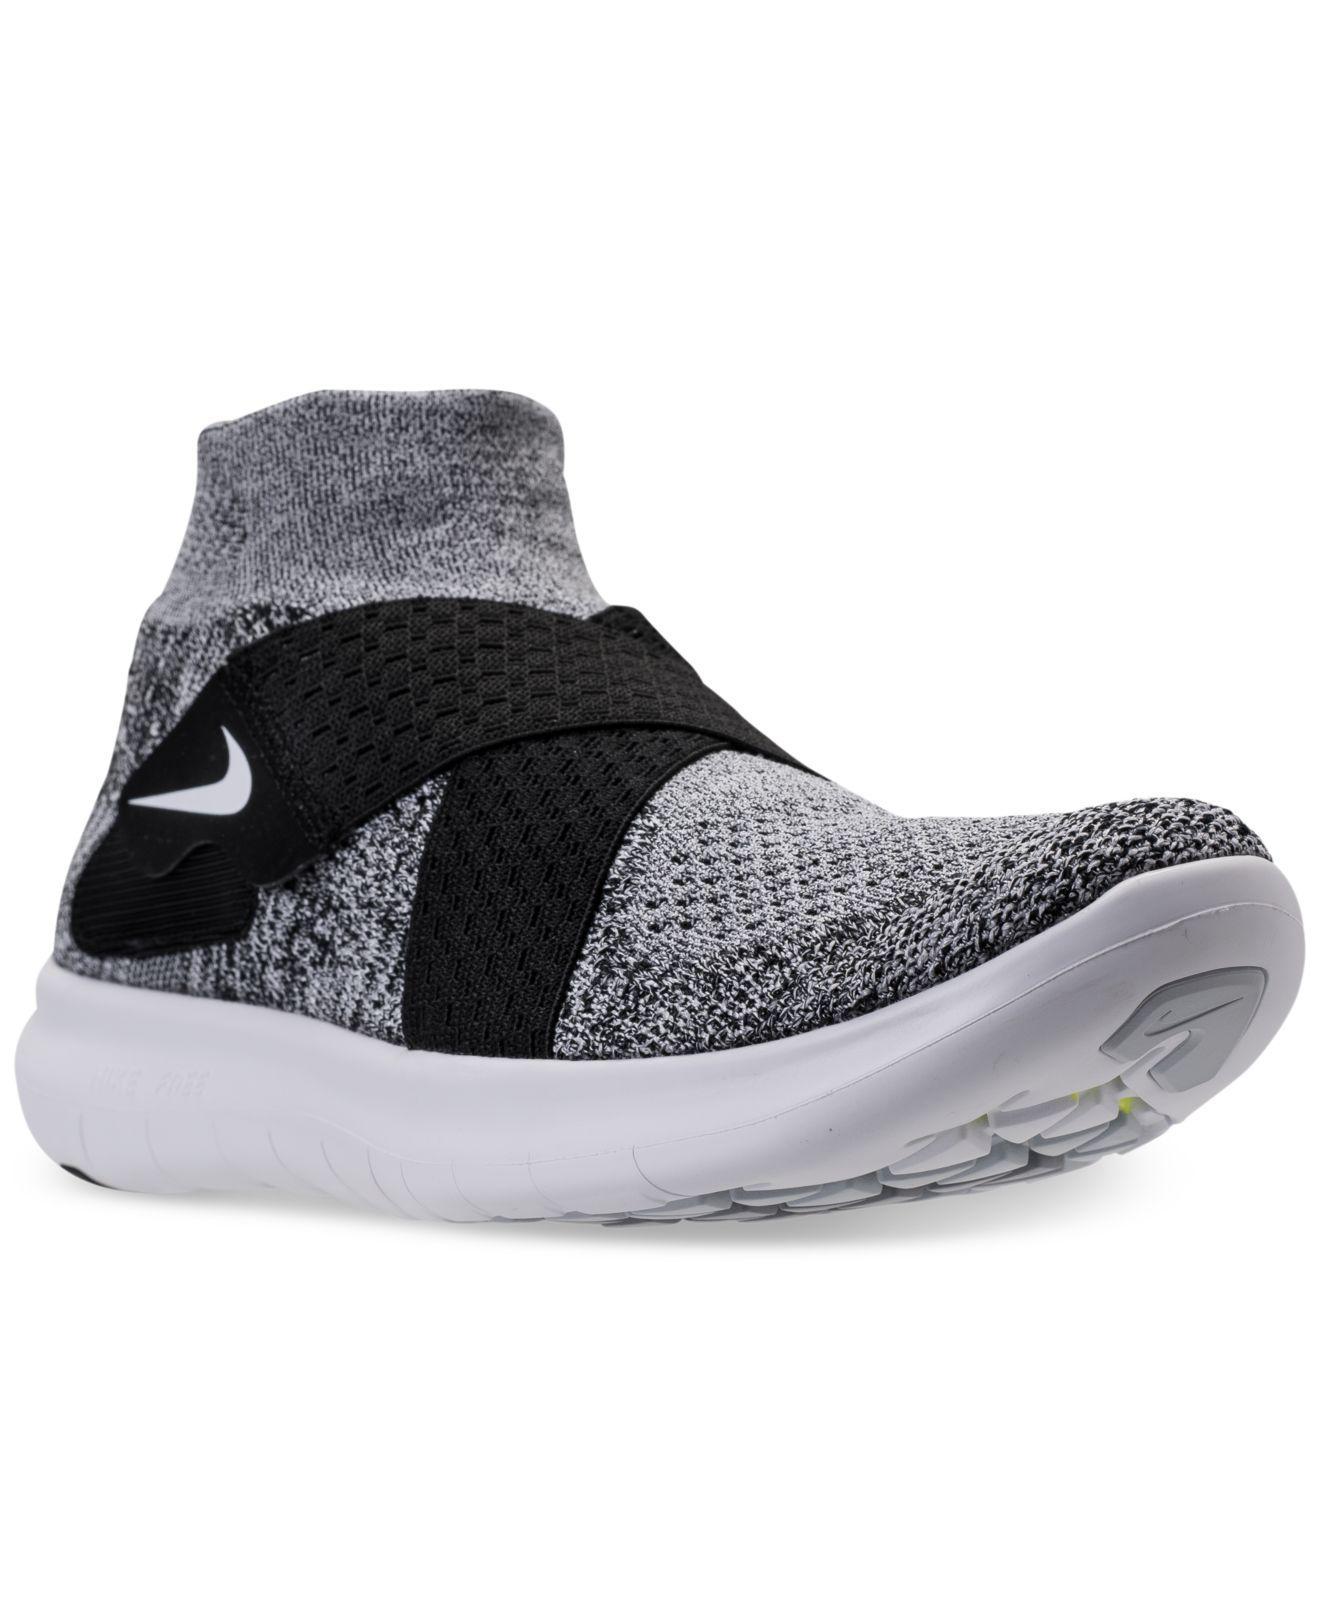 79bf2f6510338 ... shop lyst nike womens free run motion flyknit 2017 running sneakers  8c79d 74019 ...